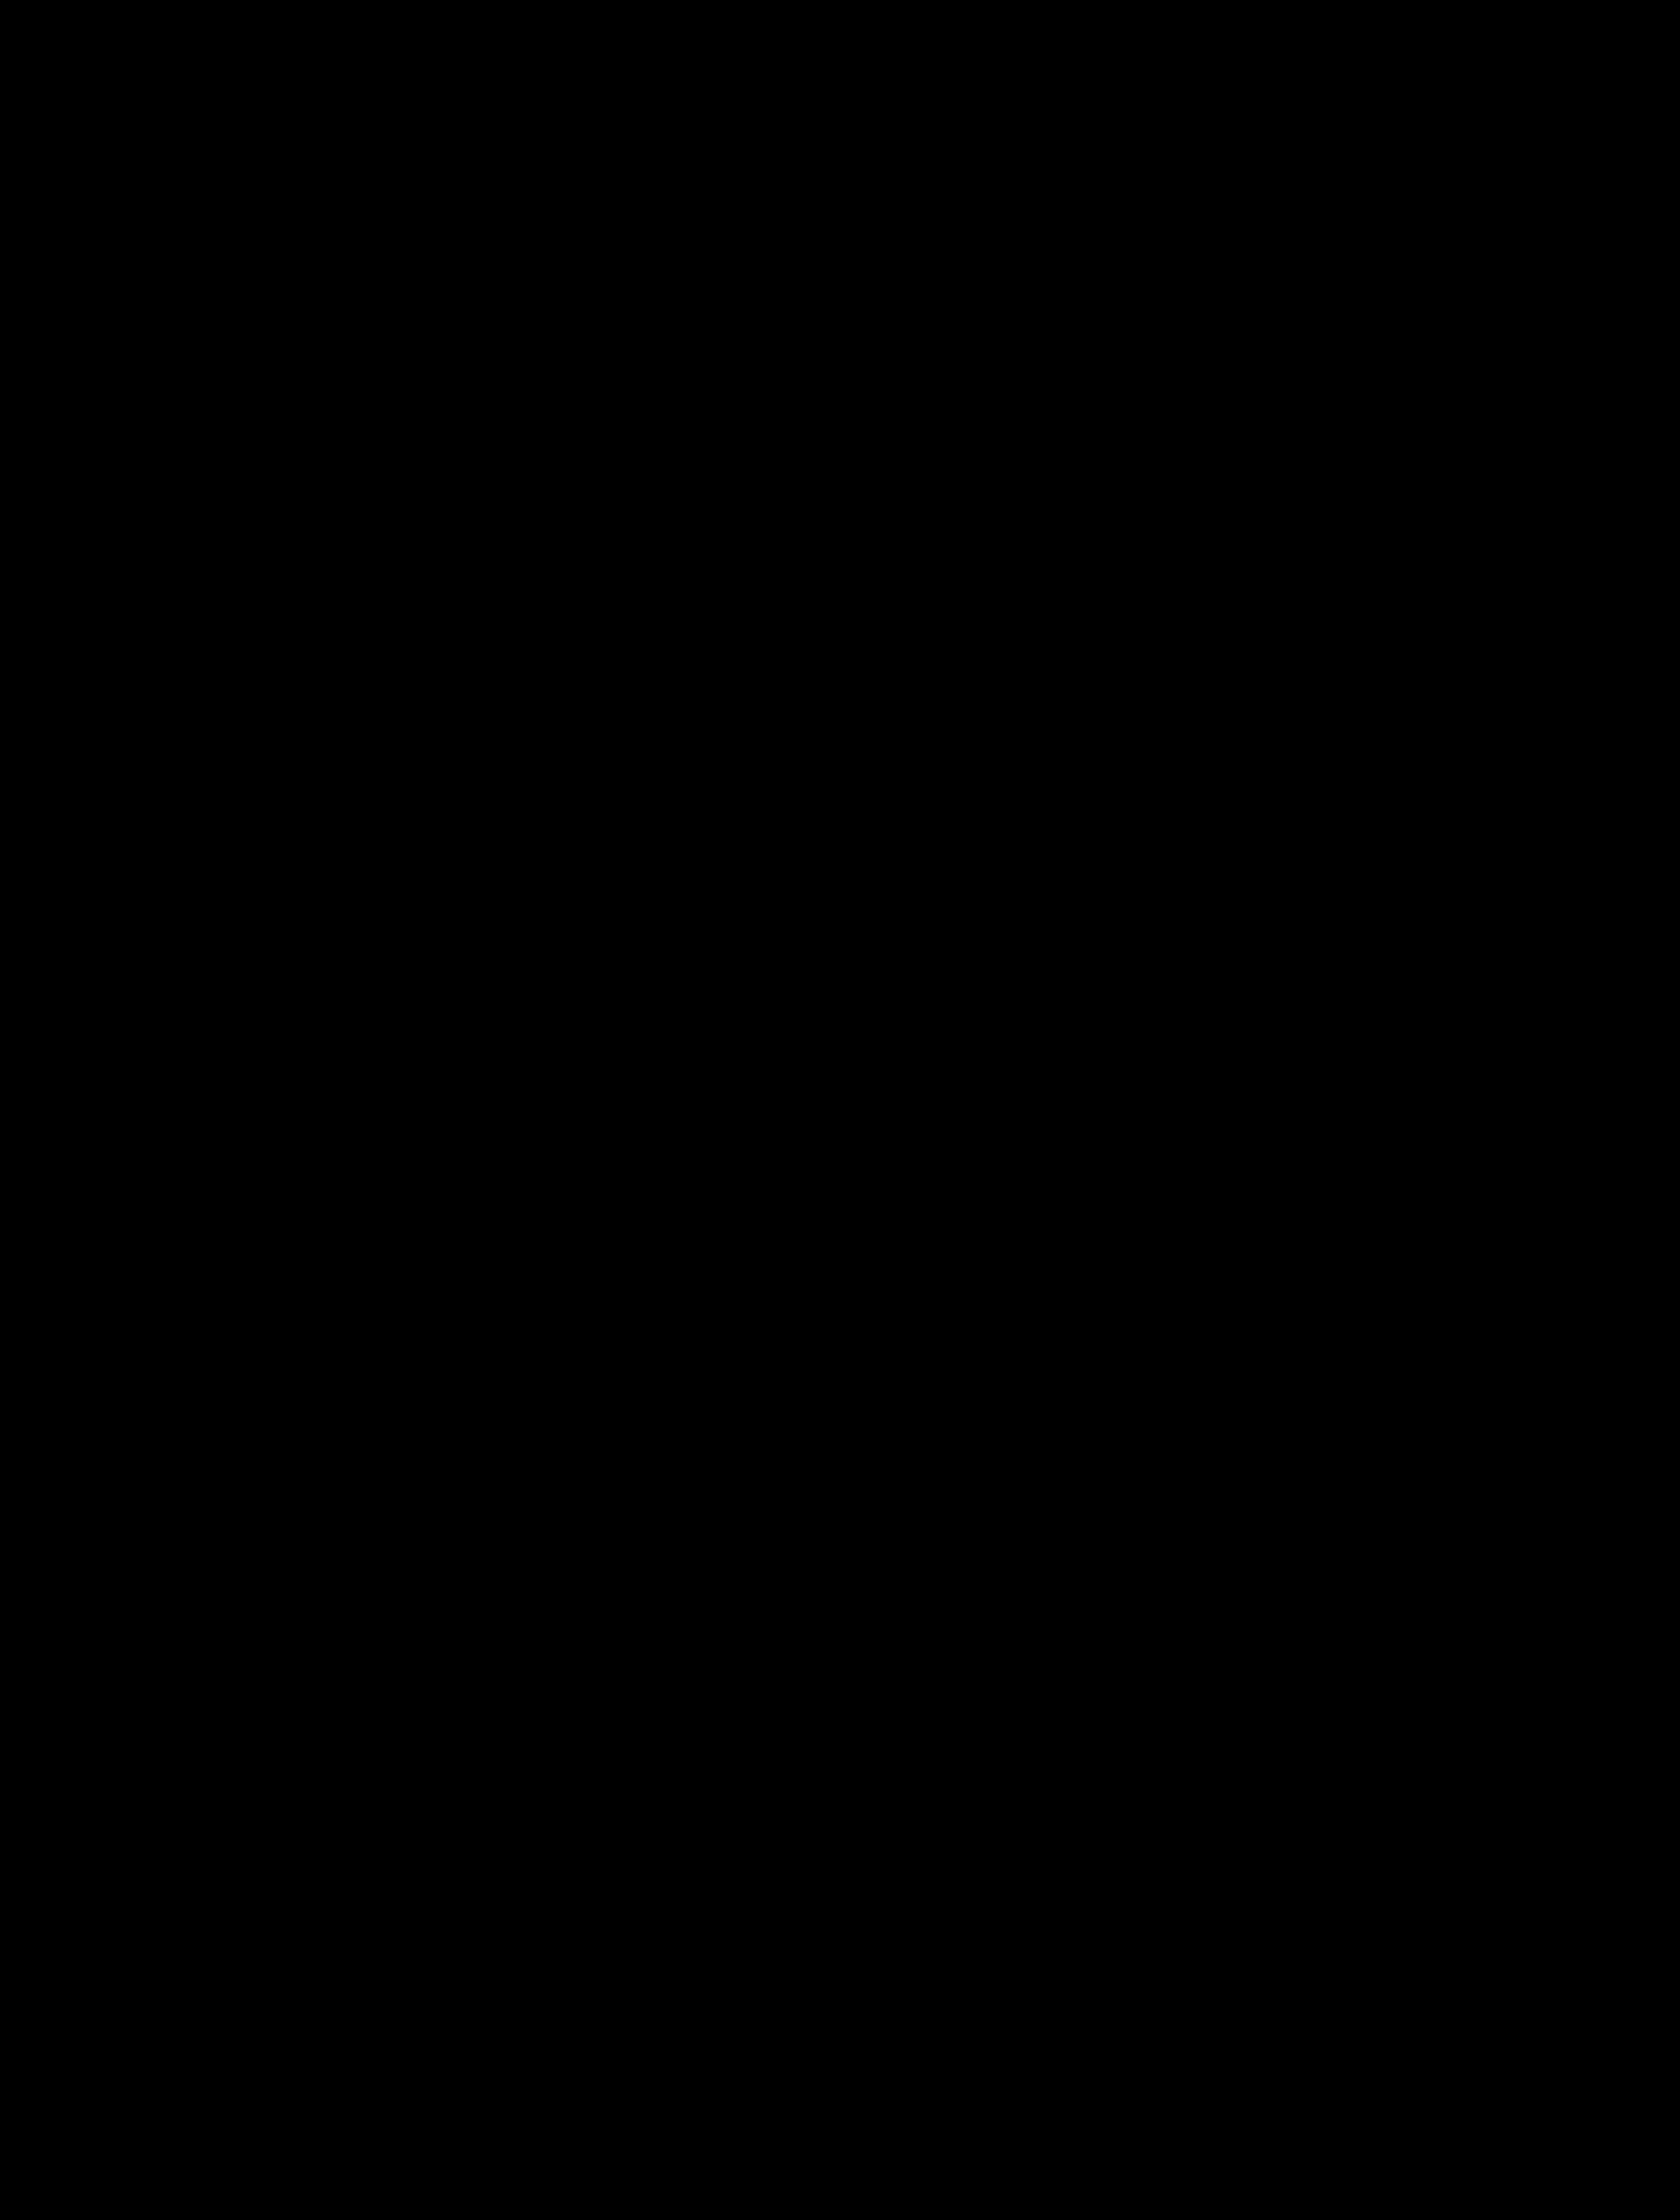 Lightning Bolt Icon Vector Clipart image.